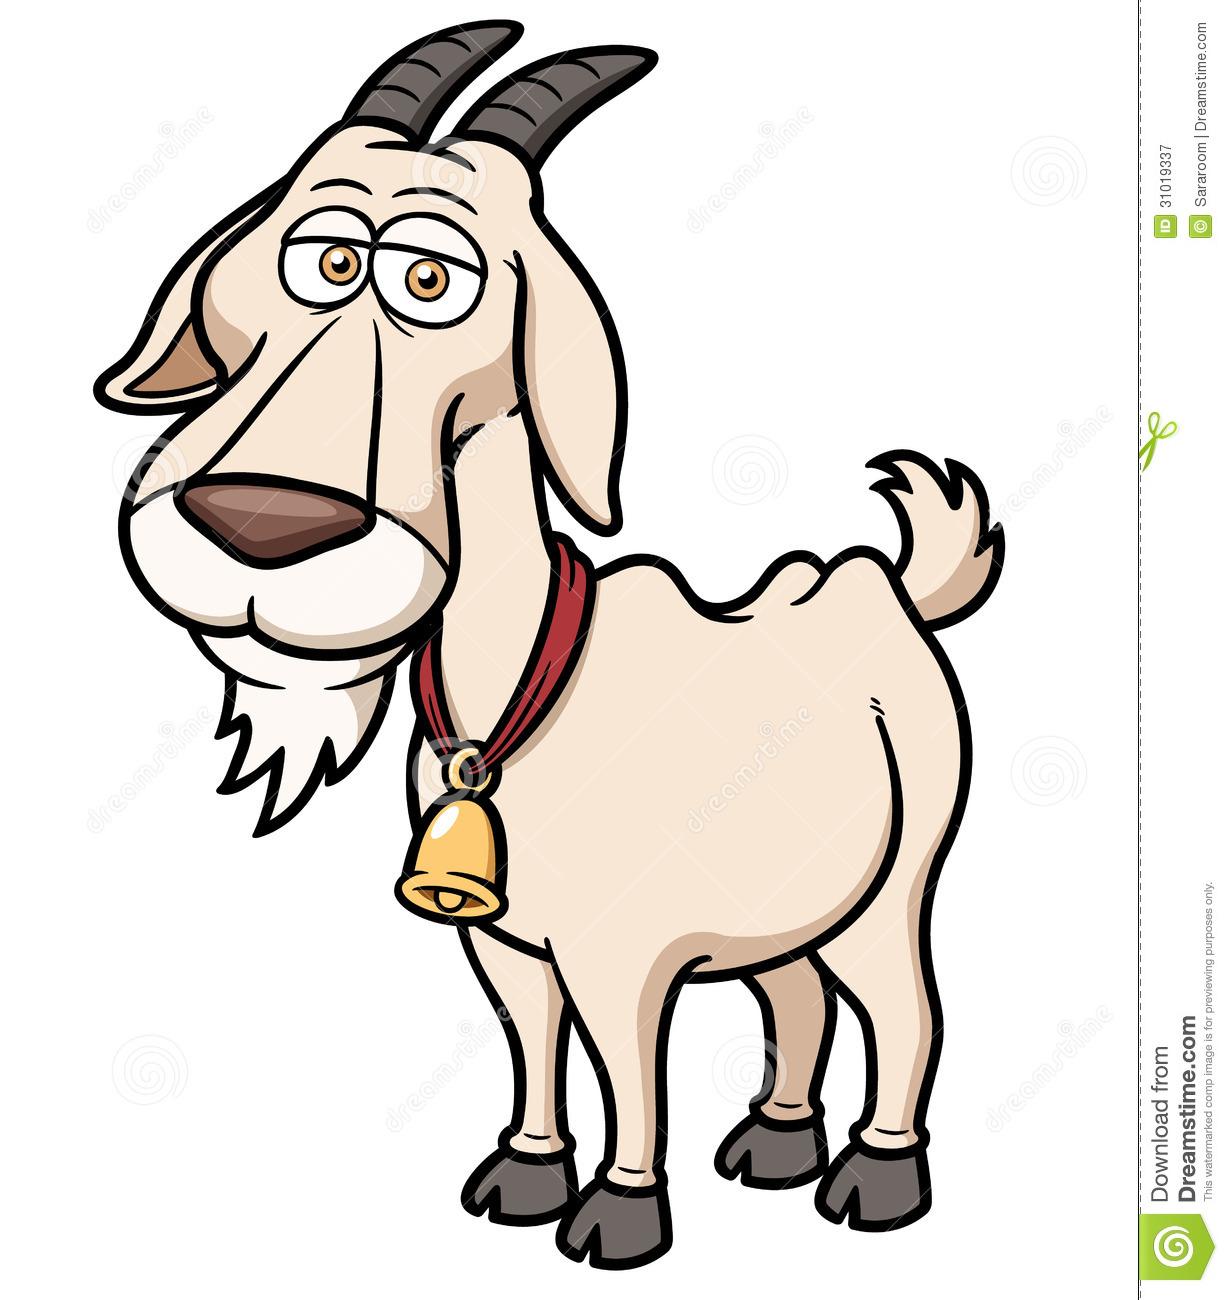 Mountain goat images clip art